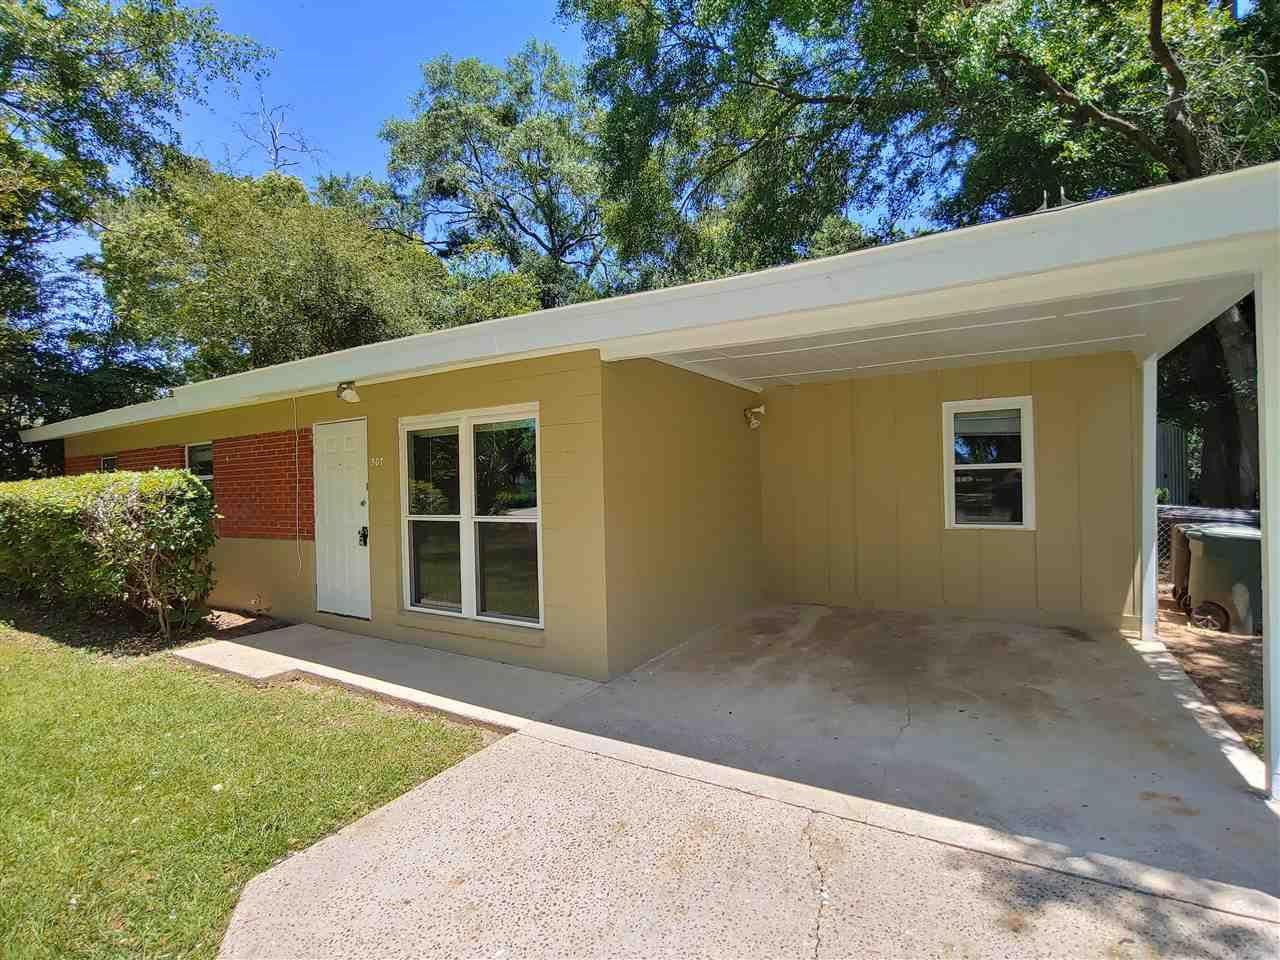 Photo of 507 Ausley Road, TALLAHASSEE, FL 32304 (MLS # 332016)